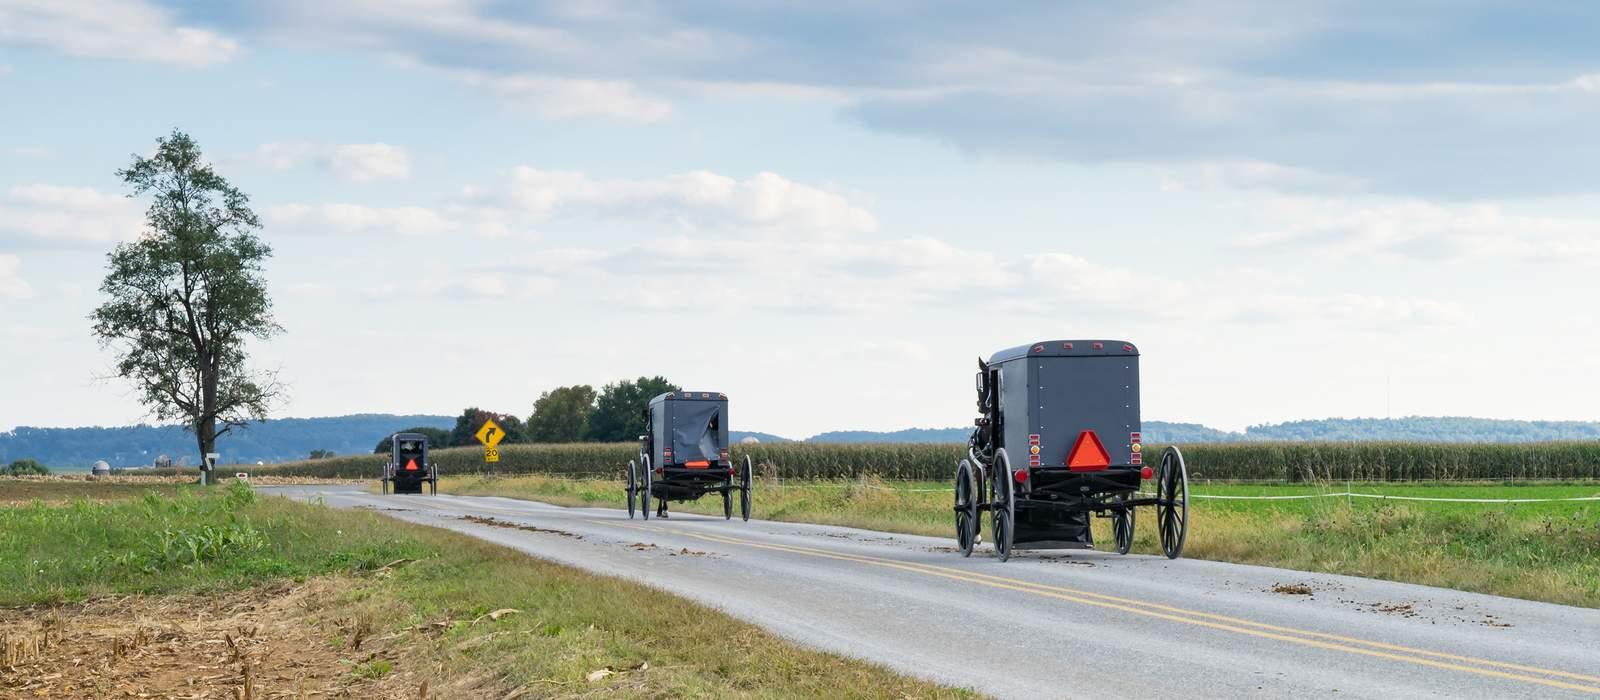 Amish Pferdekutschen in Pennsylvania